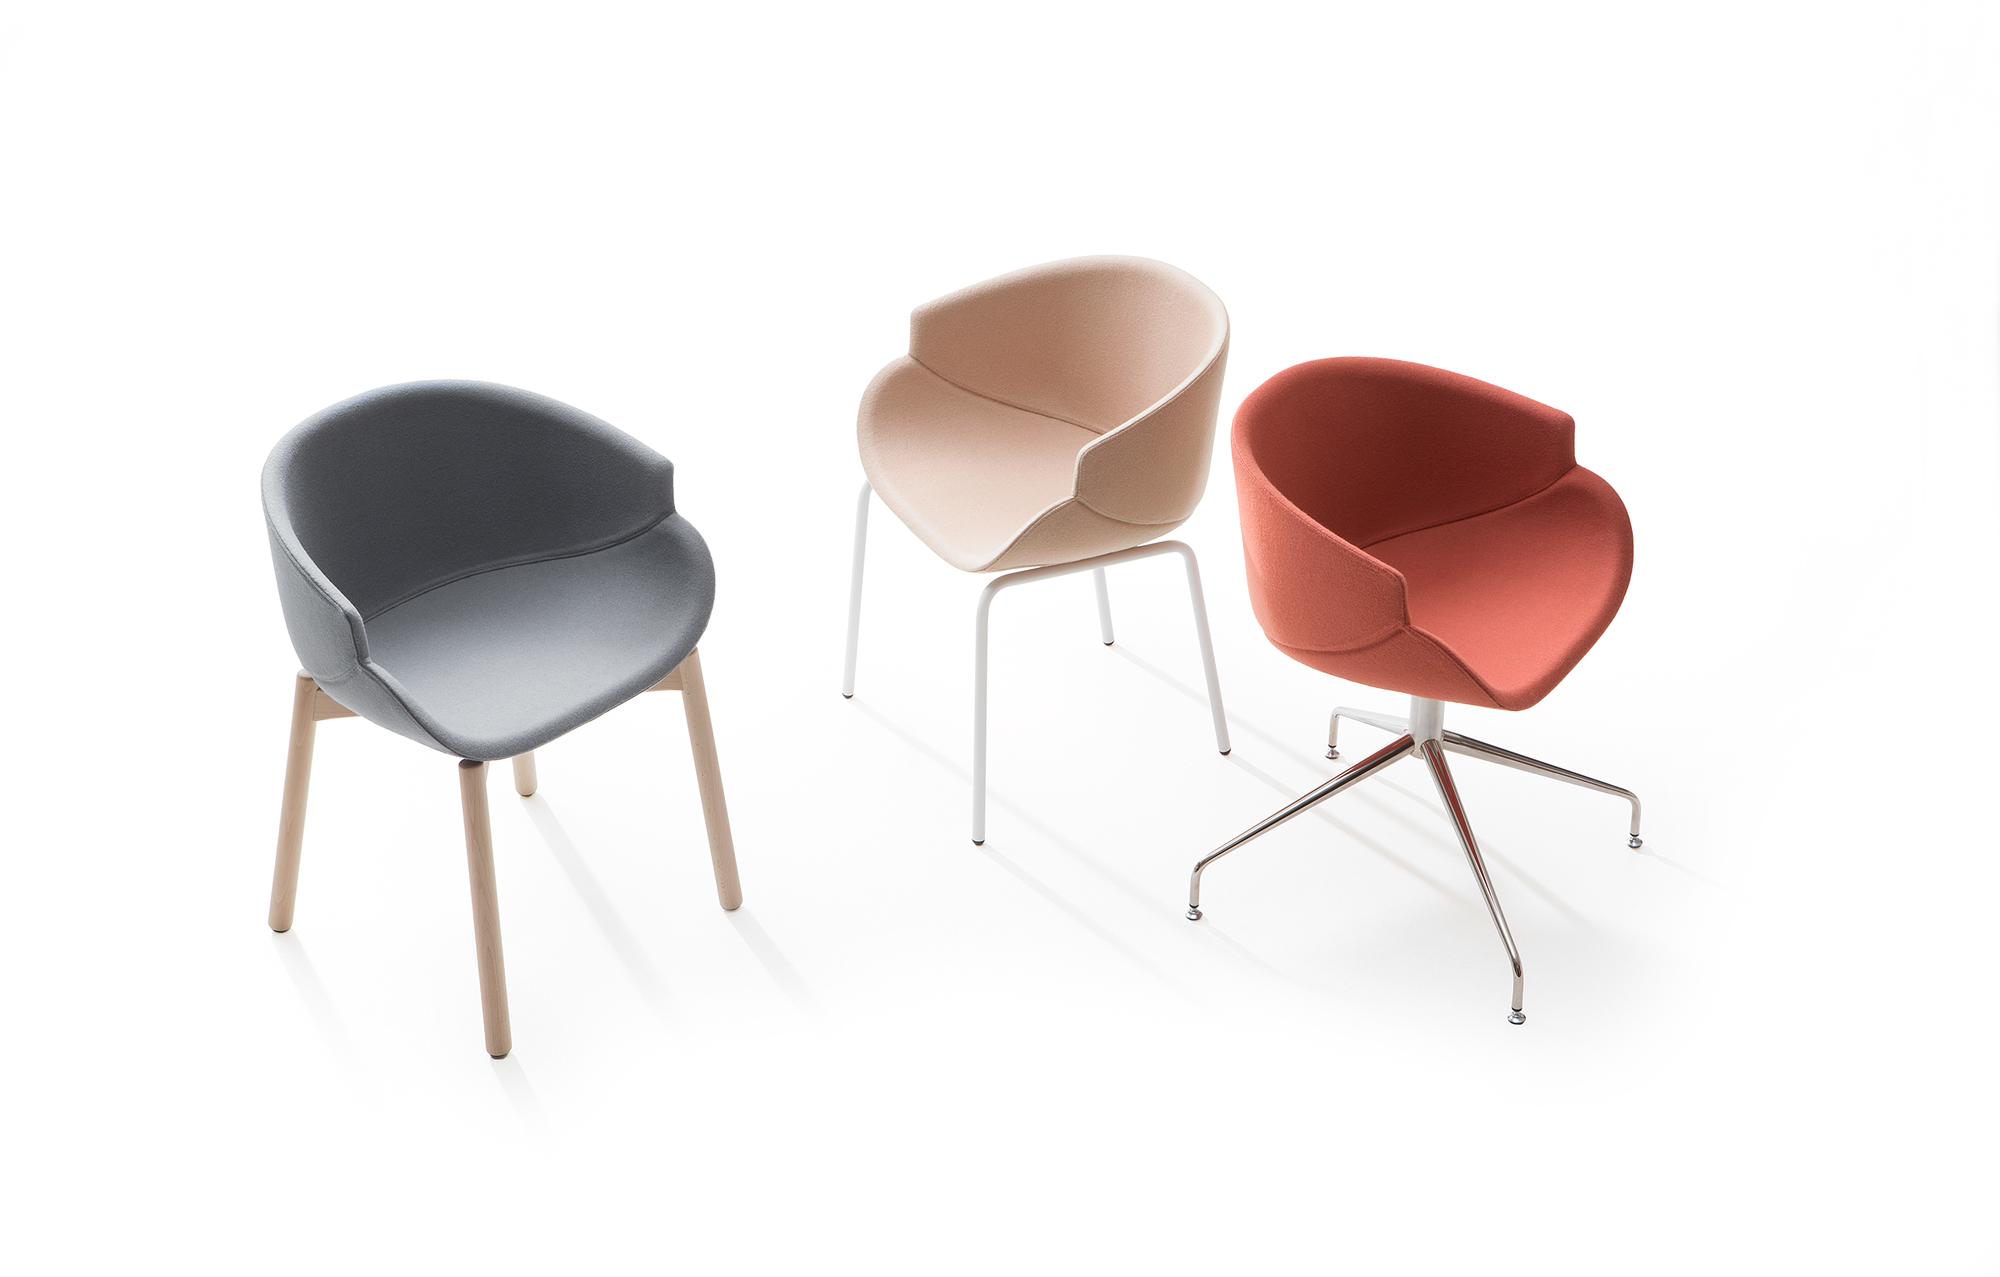 Bix Chair by B-Line